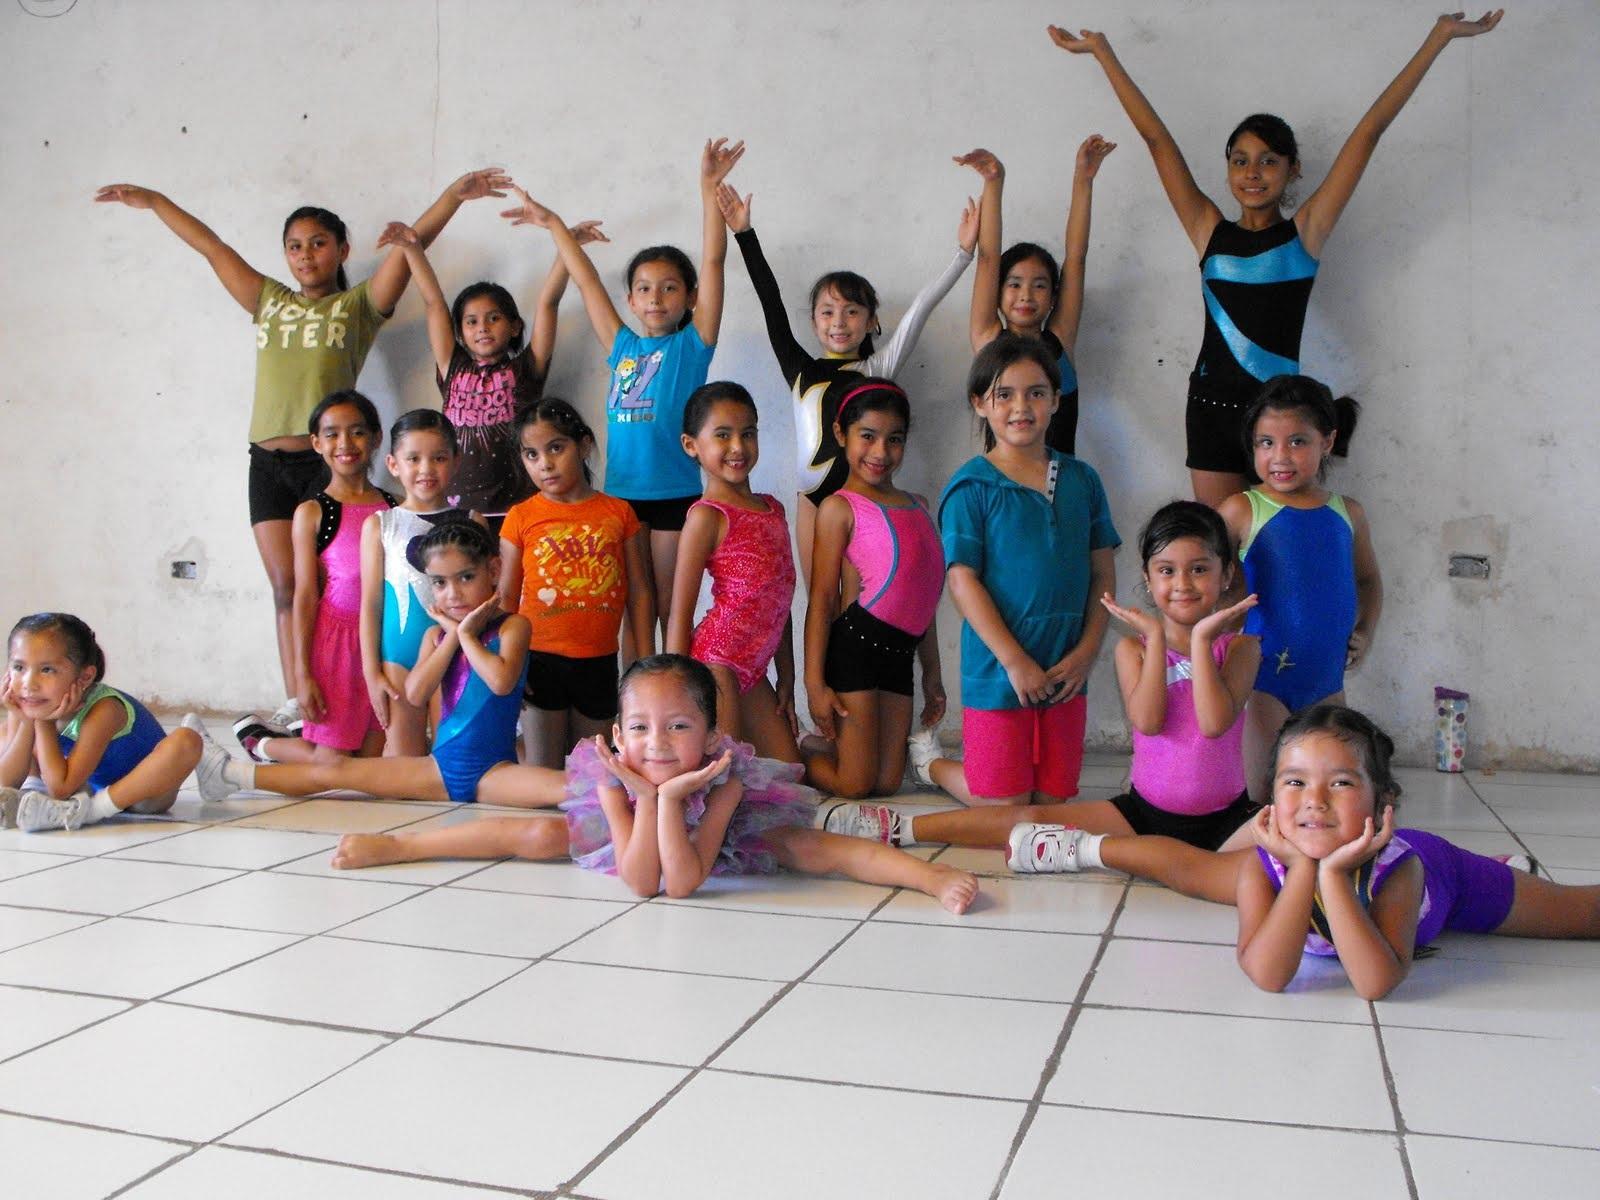 Deportes sin l mite la federaci n peruana de gimnasia ya for Deportes de gimnasia